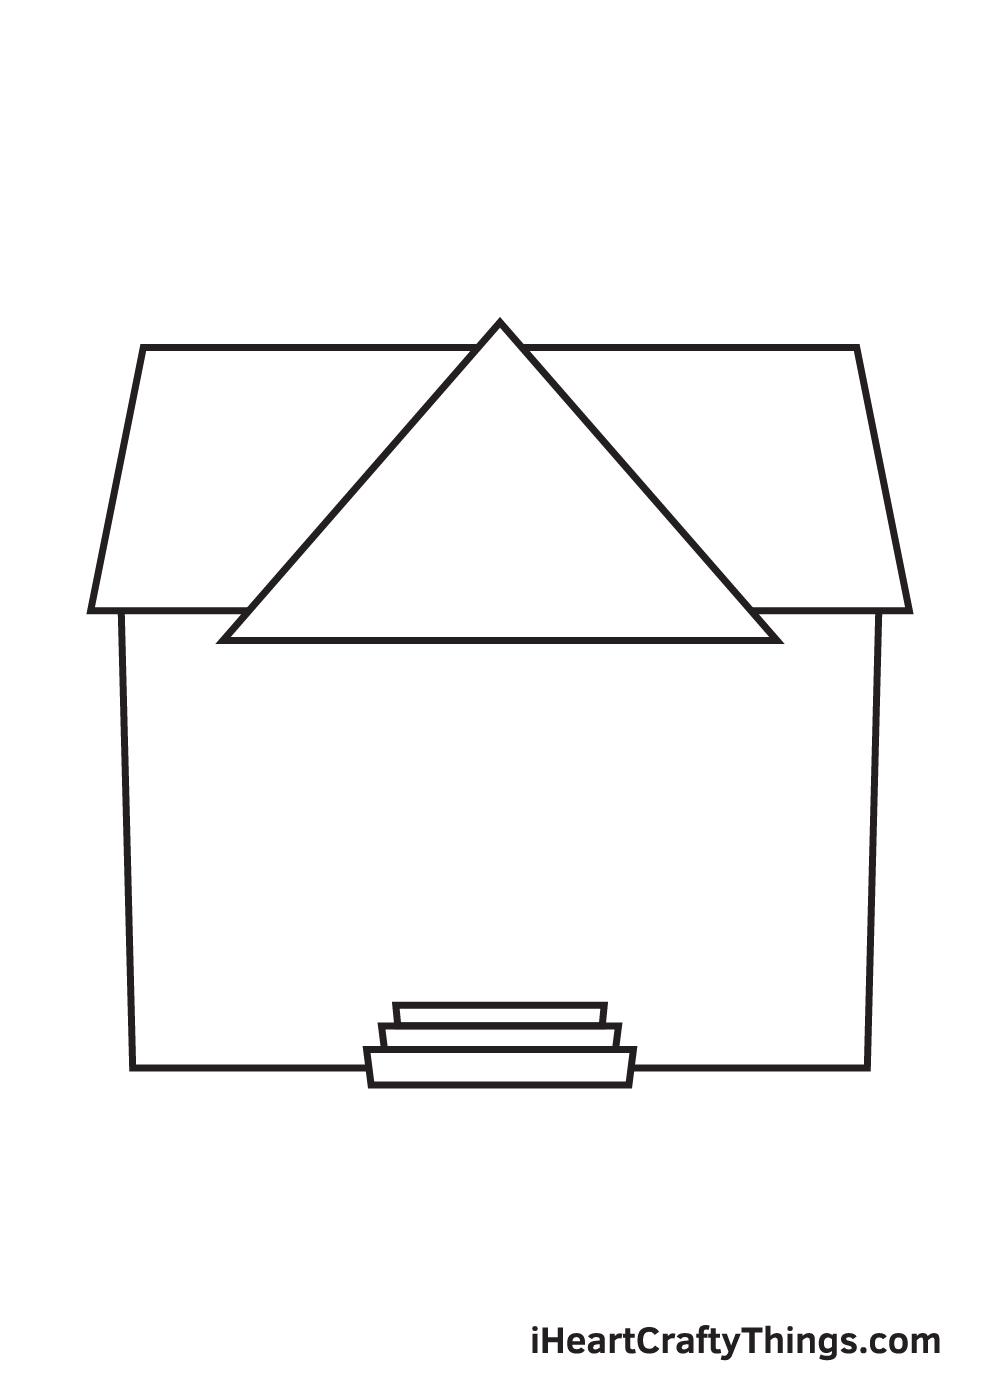 school drawing step 4